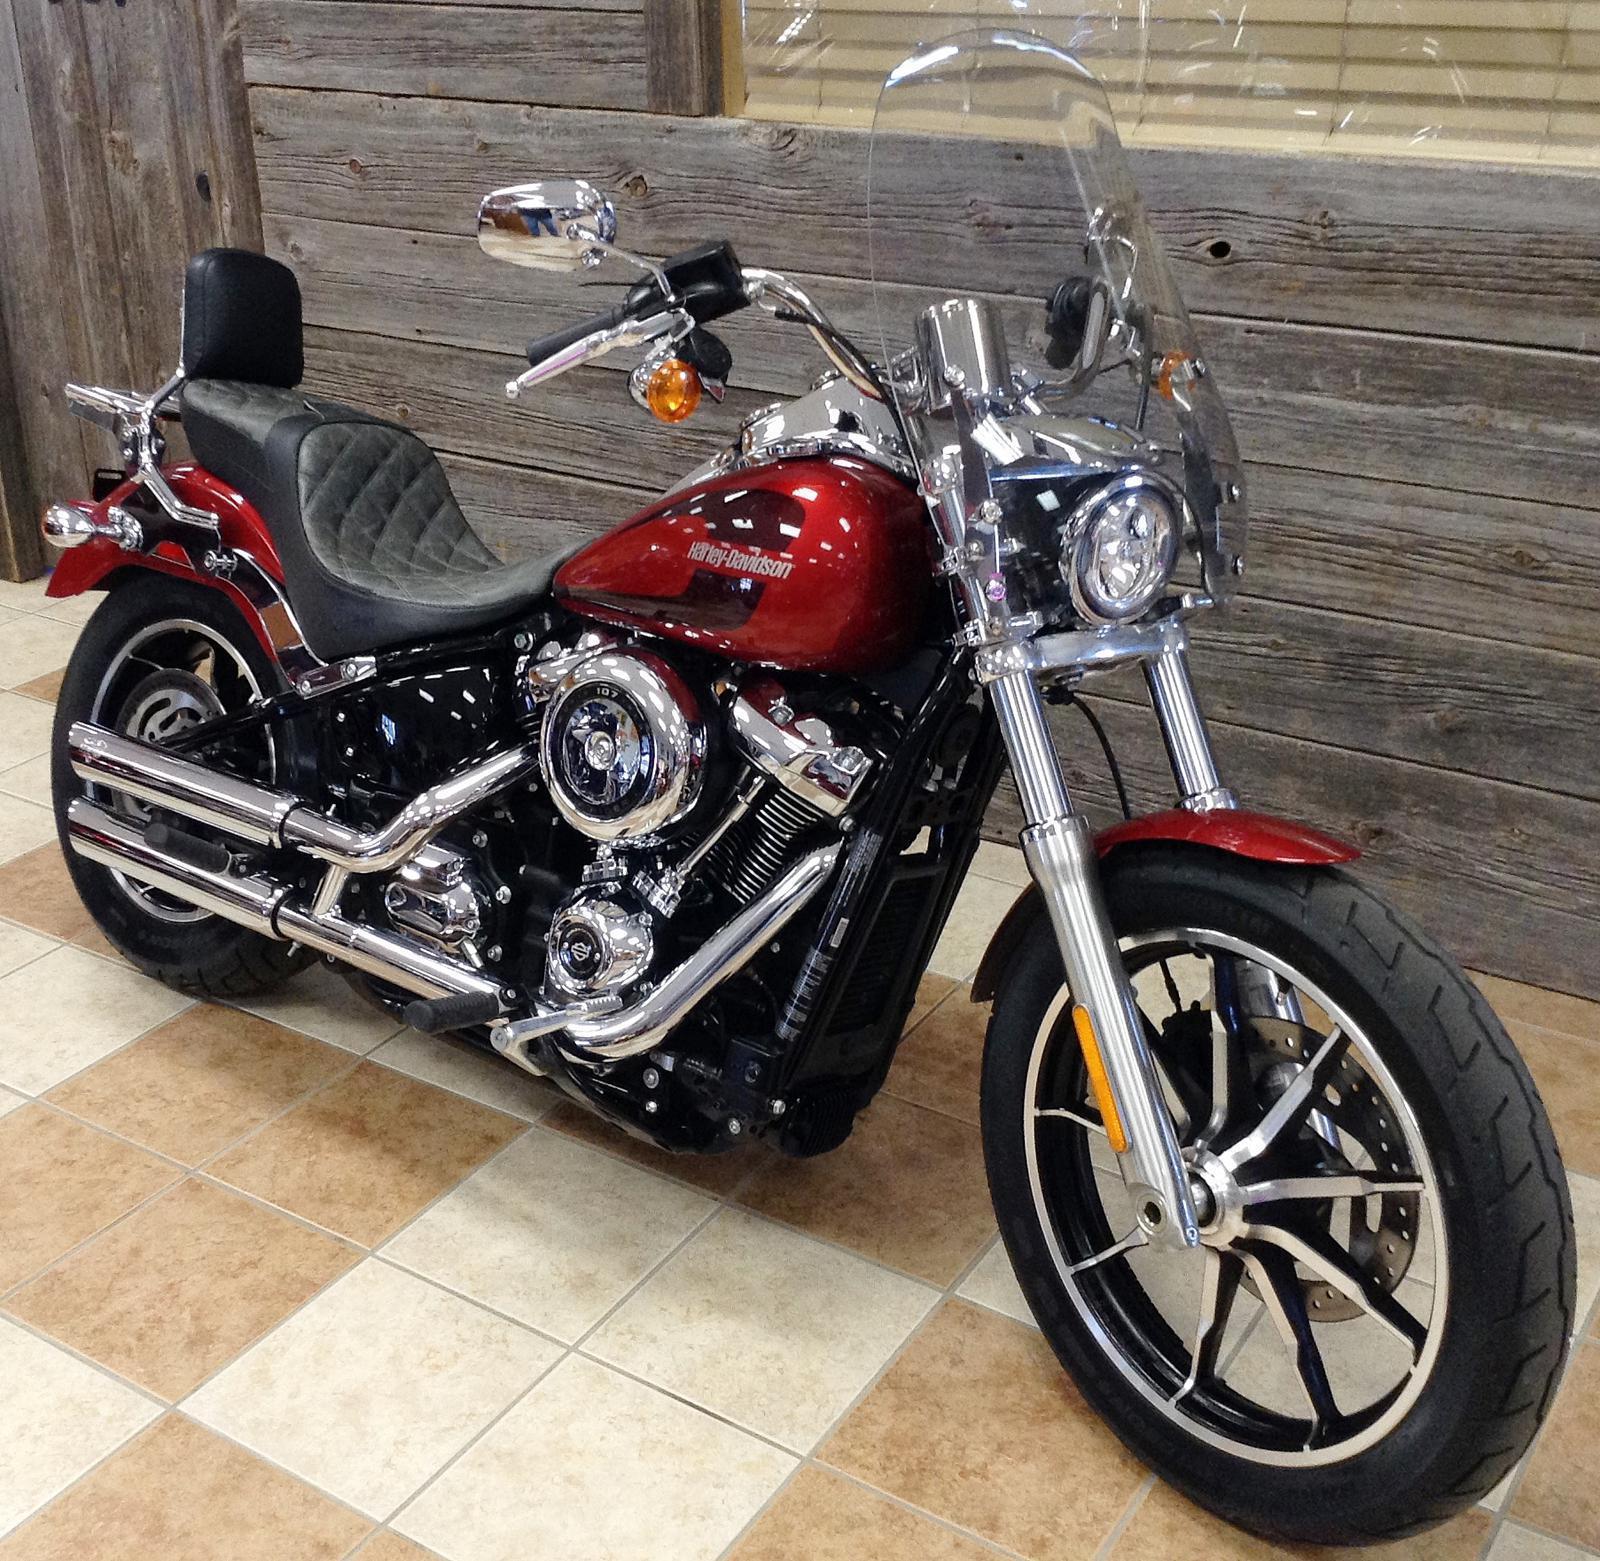 Groovy 2018 Harley Davidson Low Rider Color Option Inzonedesignstudio Interior Chair Design Inzonedesignstudiocom